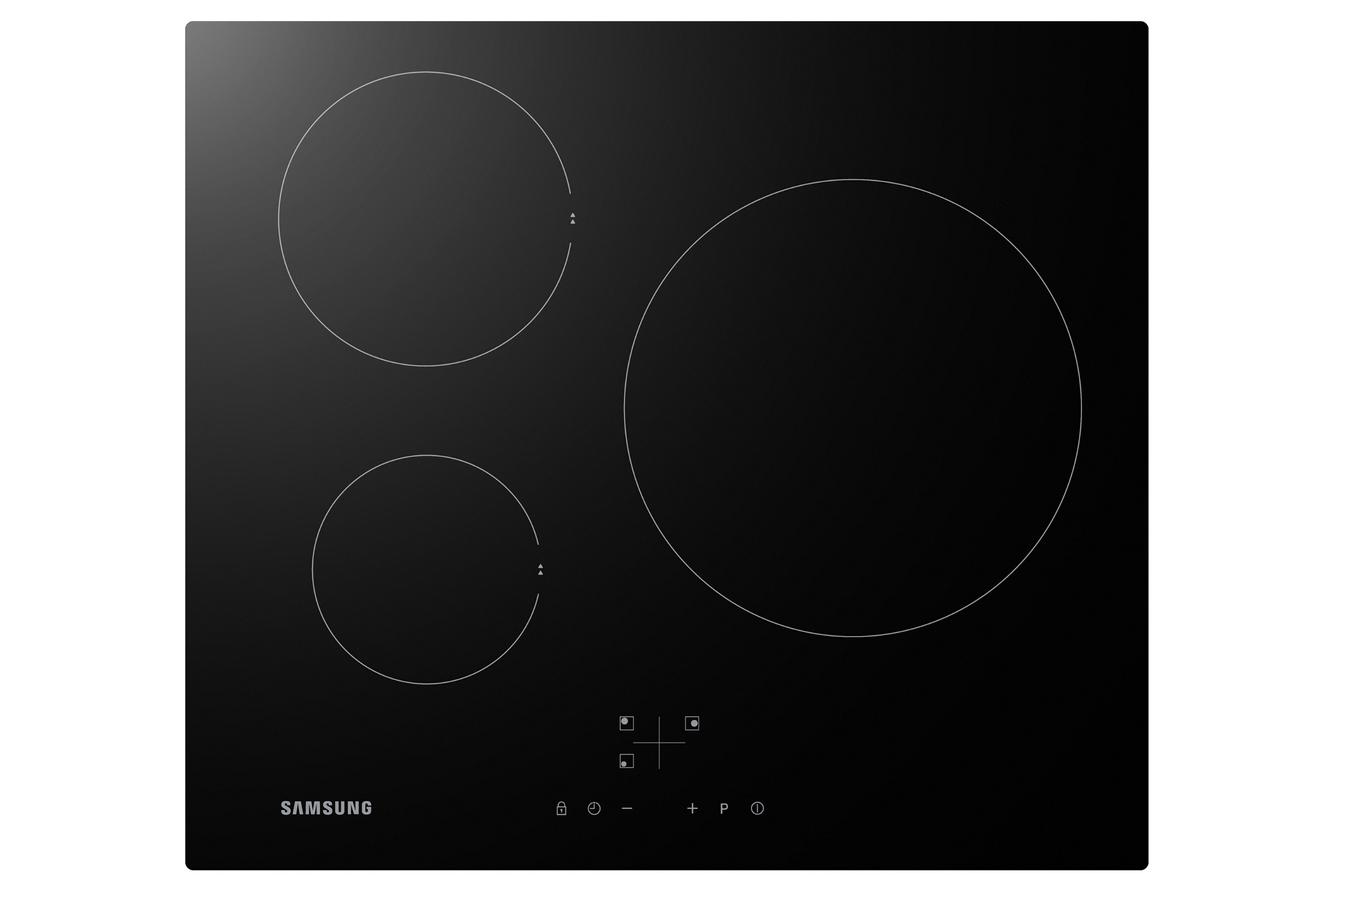 Plaque induction samsung nz63f3nm1ab ur noir nz63f3nm1ab ur 3749347 darty - Plaque electrique darty ...